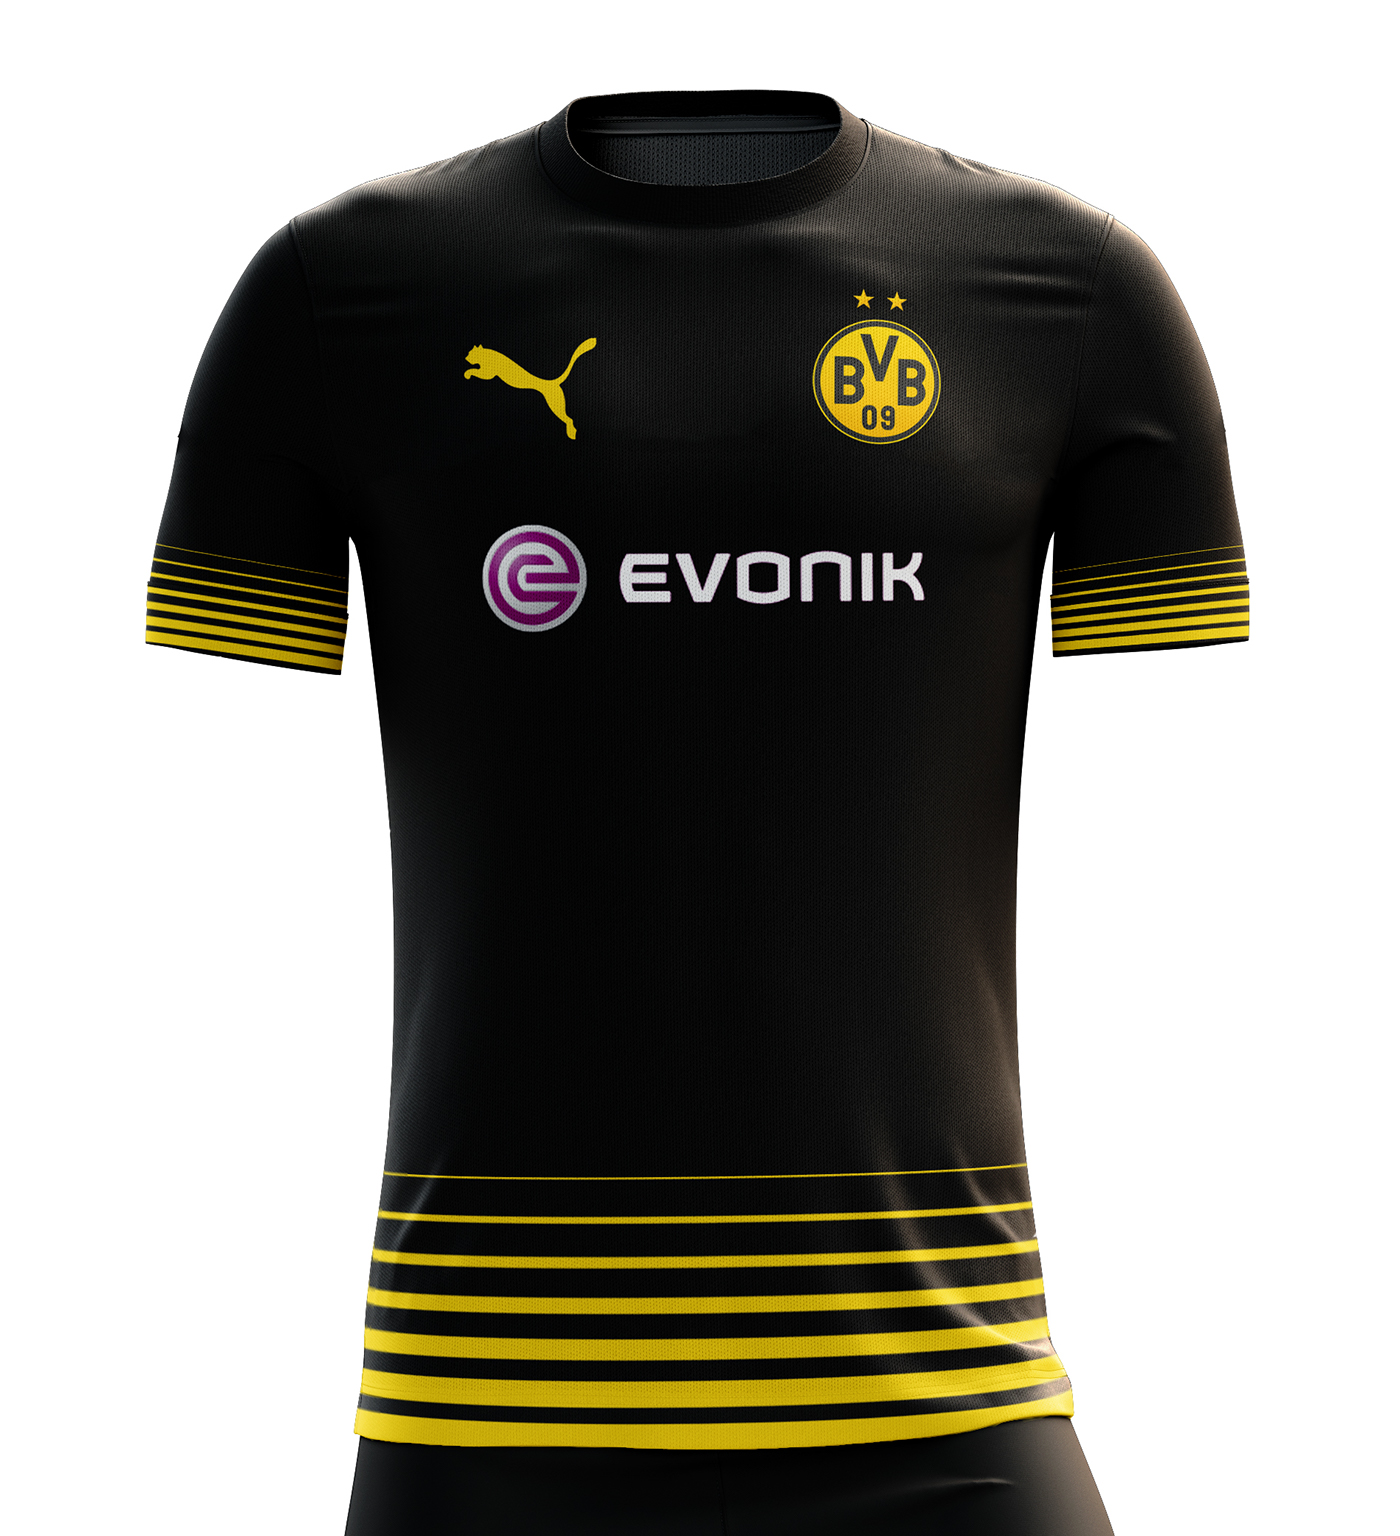 cc719995d Borussia Dortmund Football Kit 1718 on Behance soccer